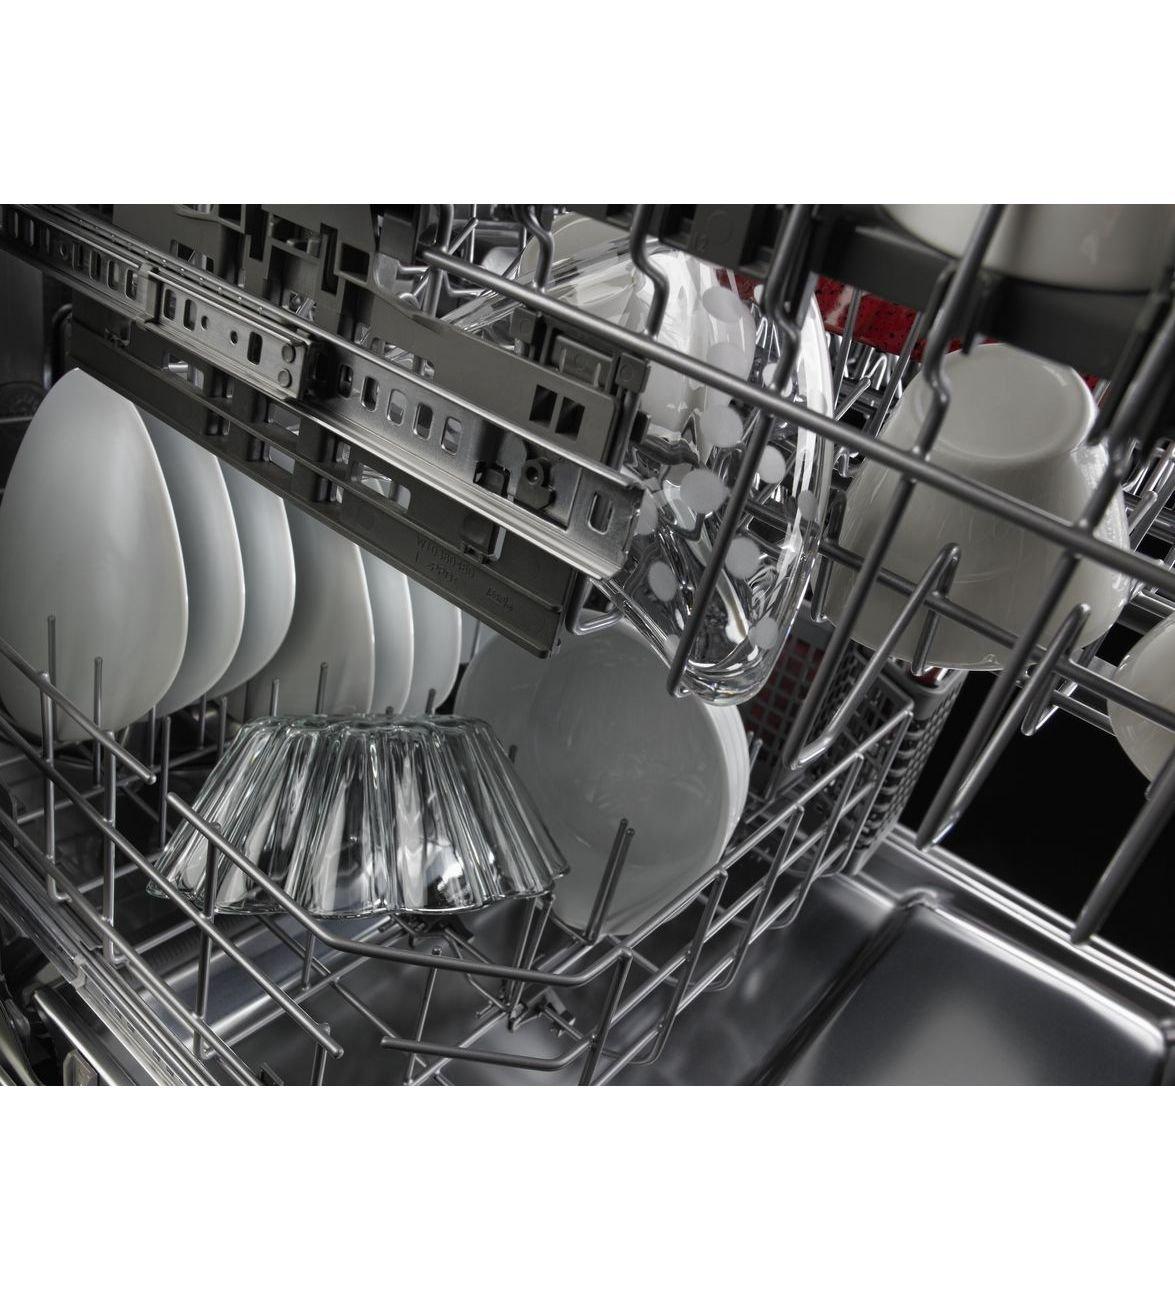 KITCHENAID KDTE404DSS 24'' 6-Cycle/6-Option Dishwasher, Architect